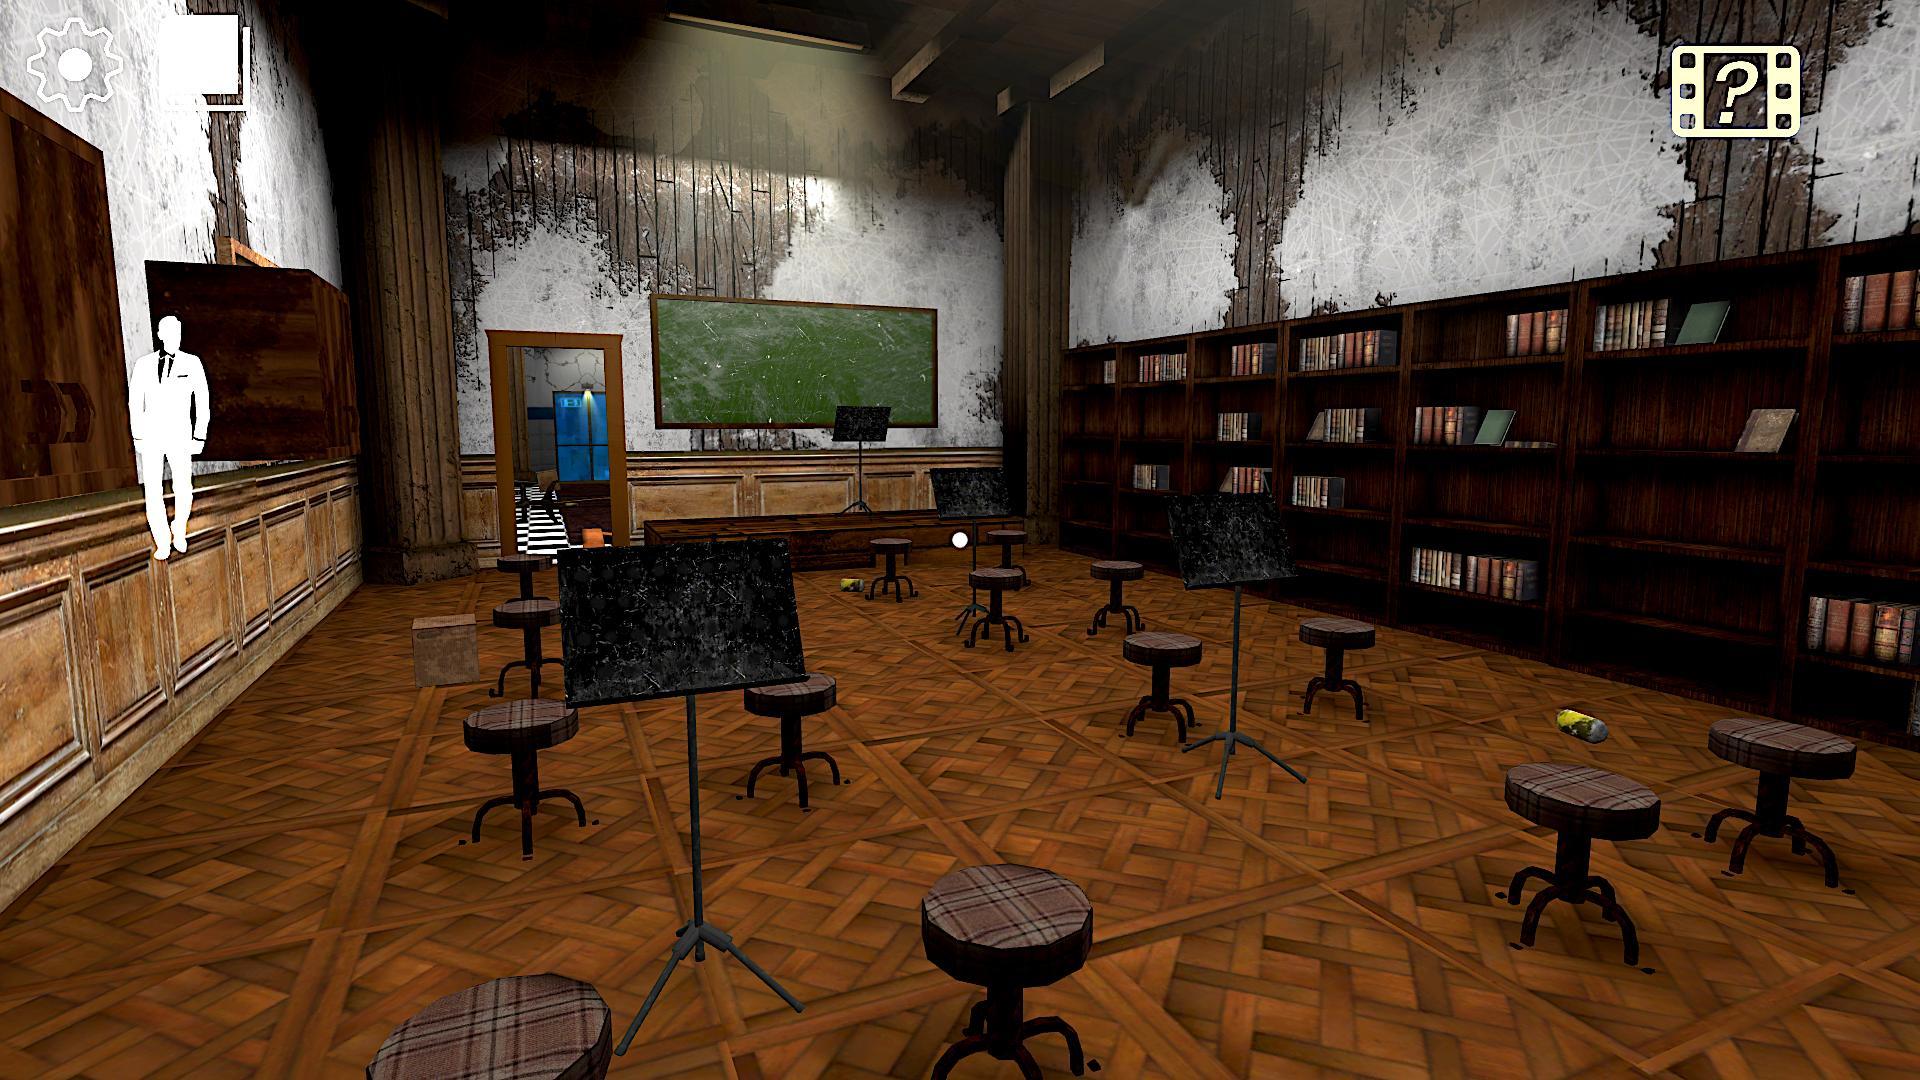 Evil Erich Sann : The New Horror Games. 2.5.0 Screenshot 13